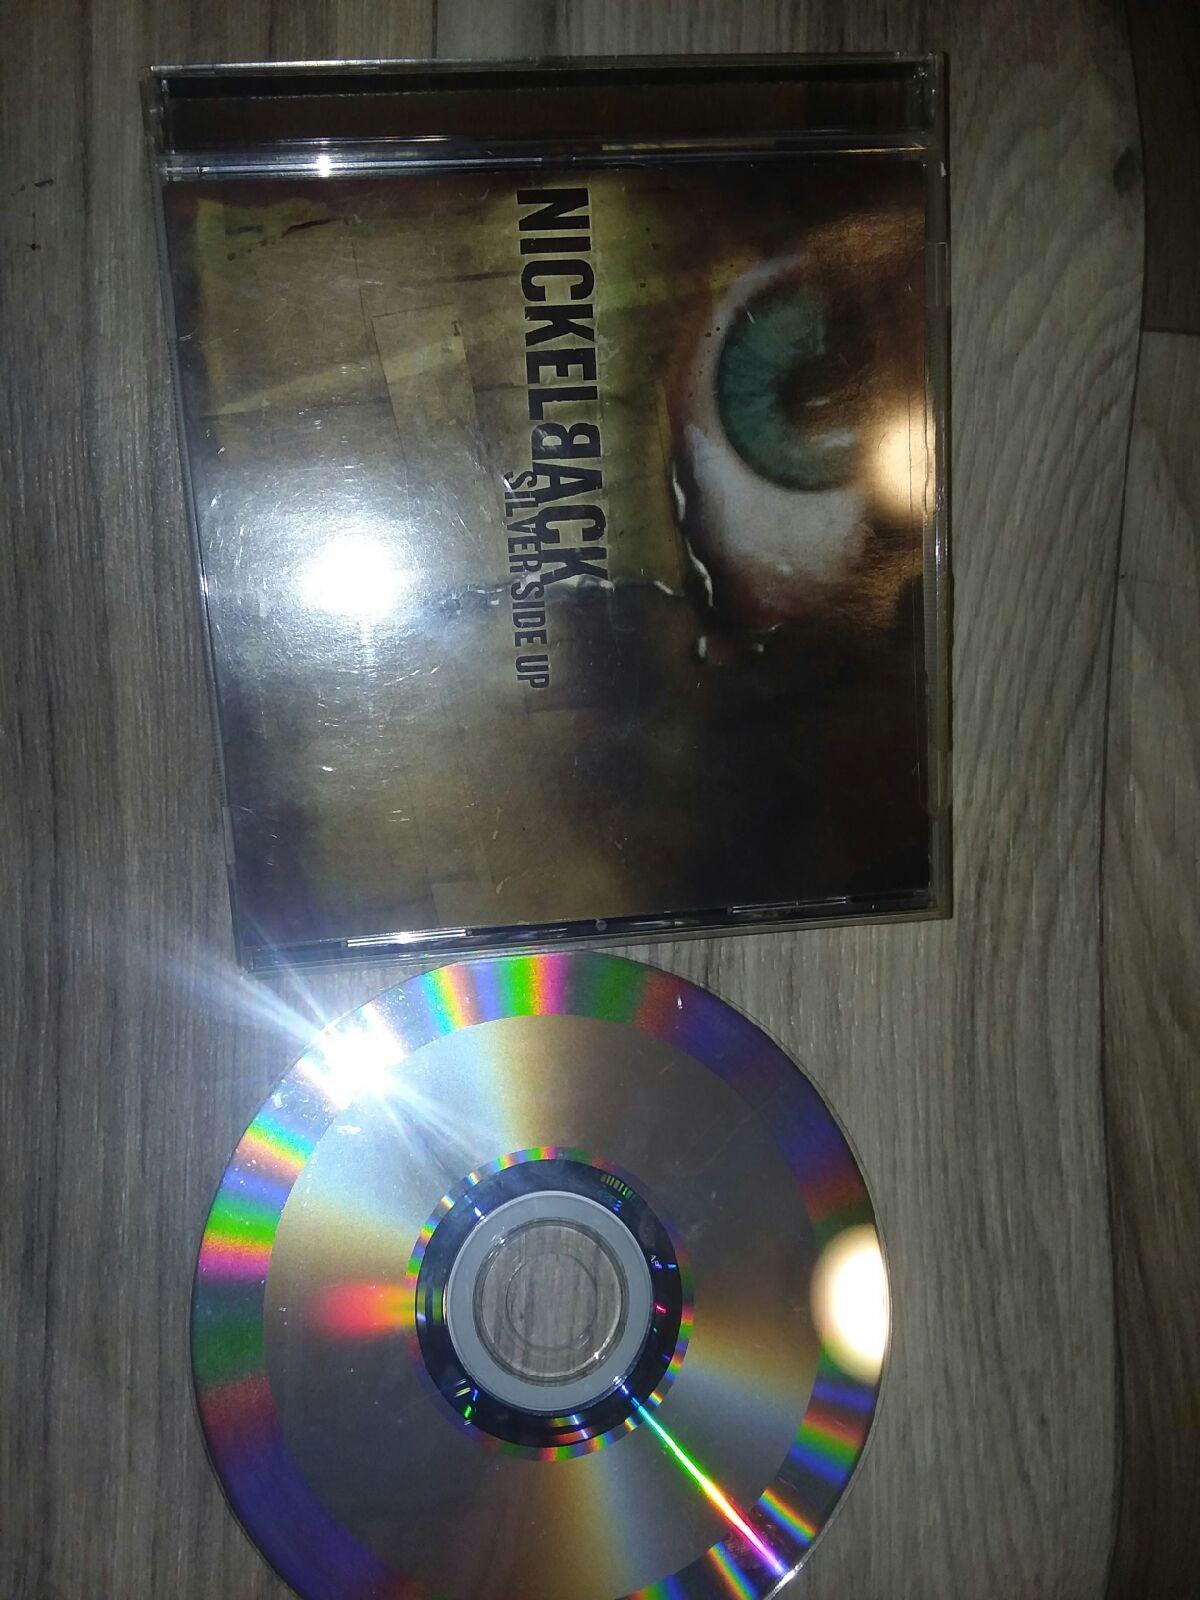 Nickelback silver side up cd